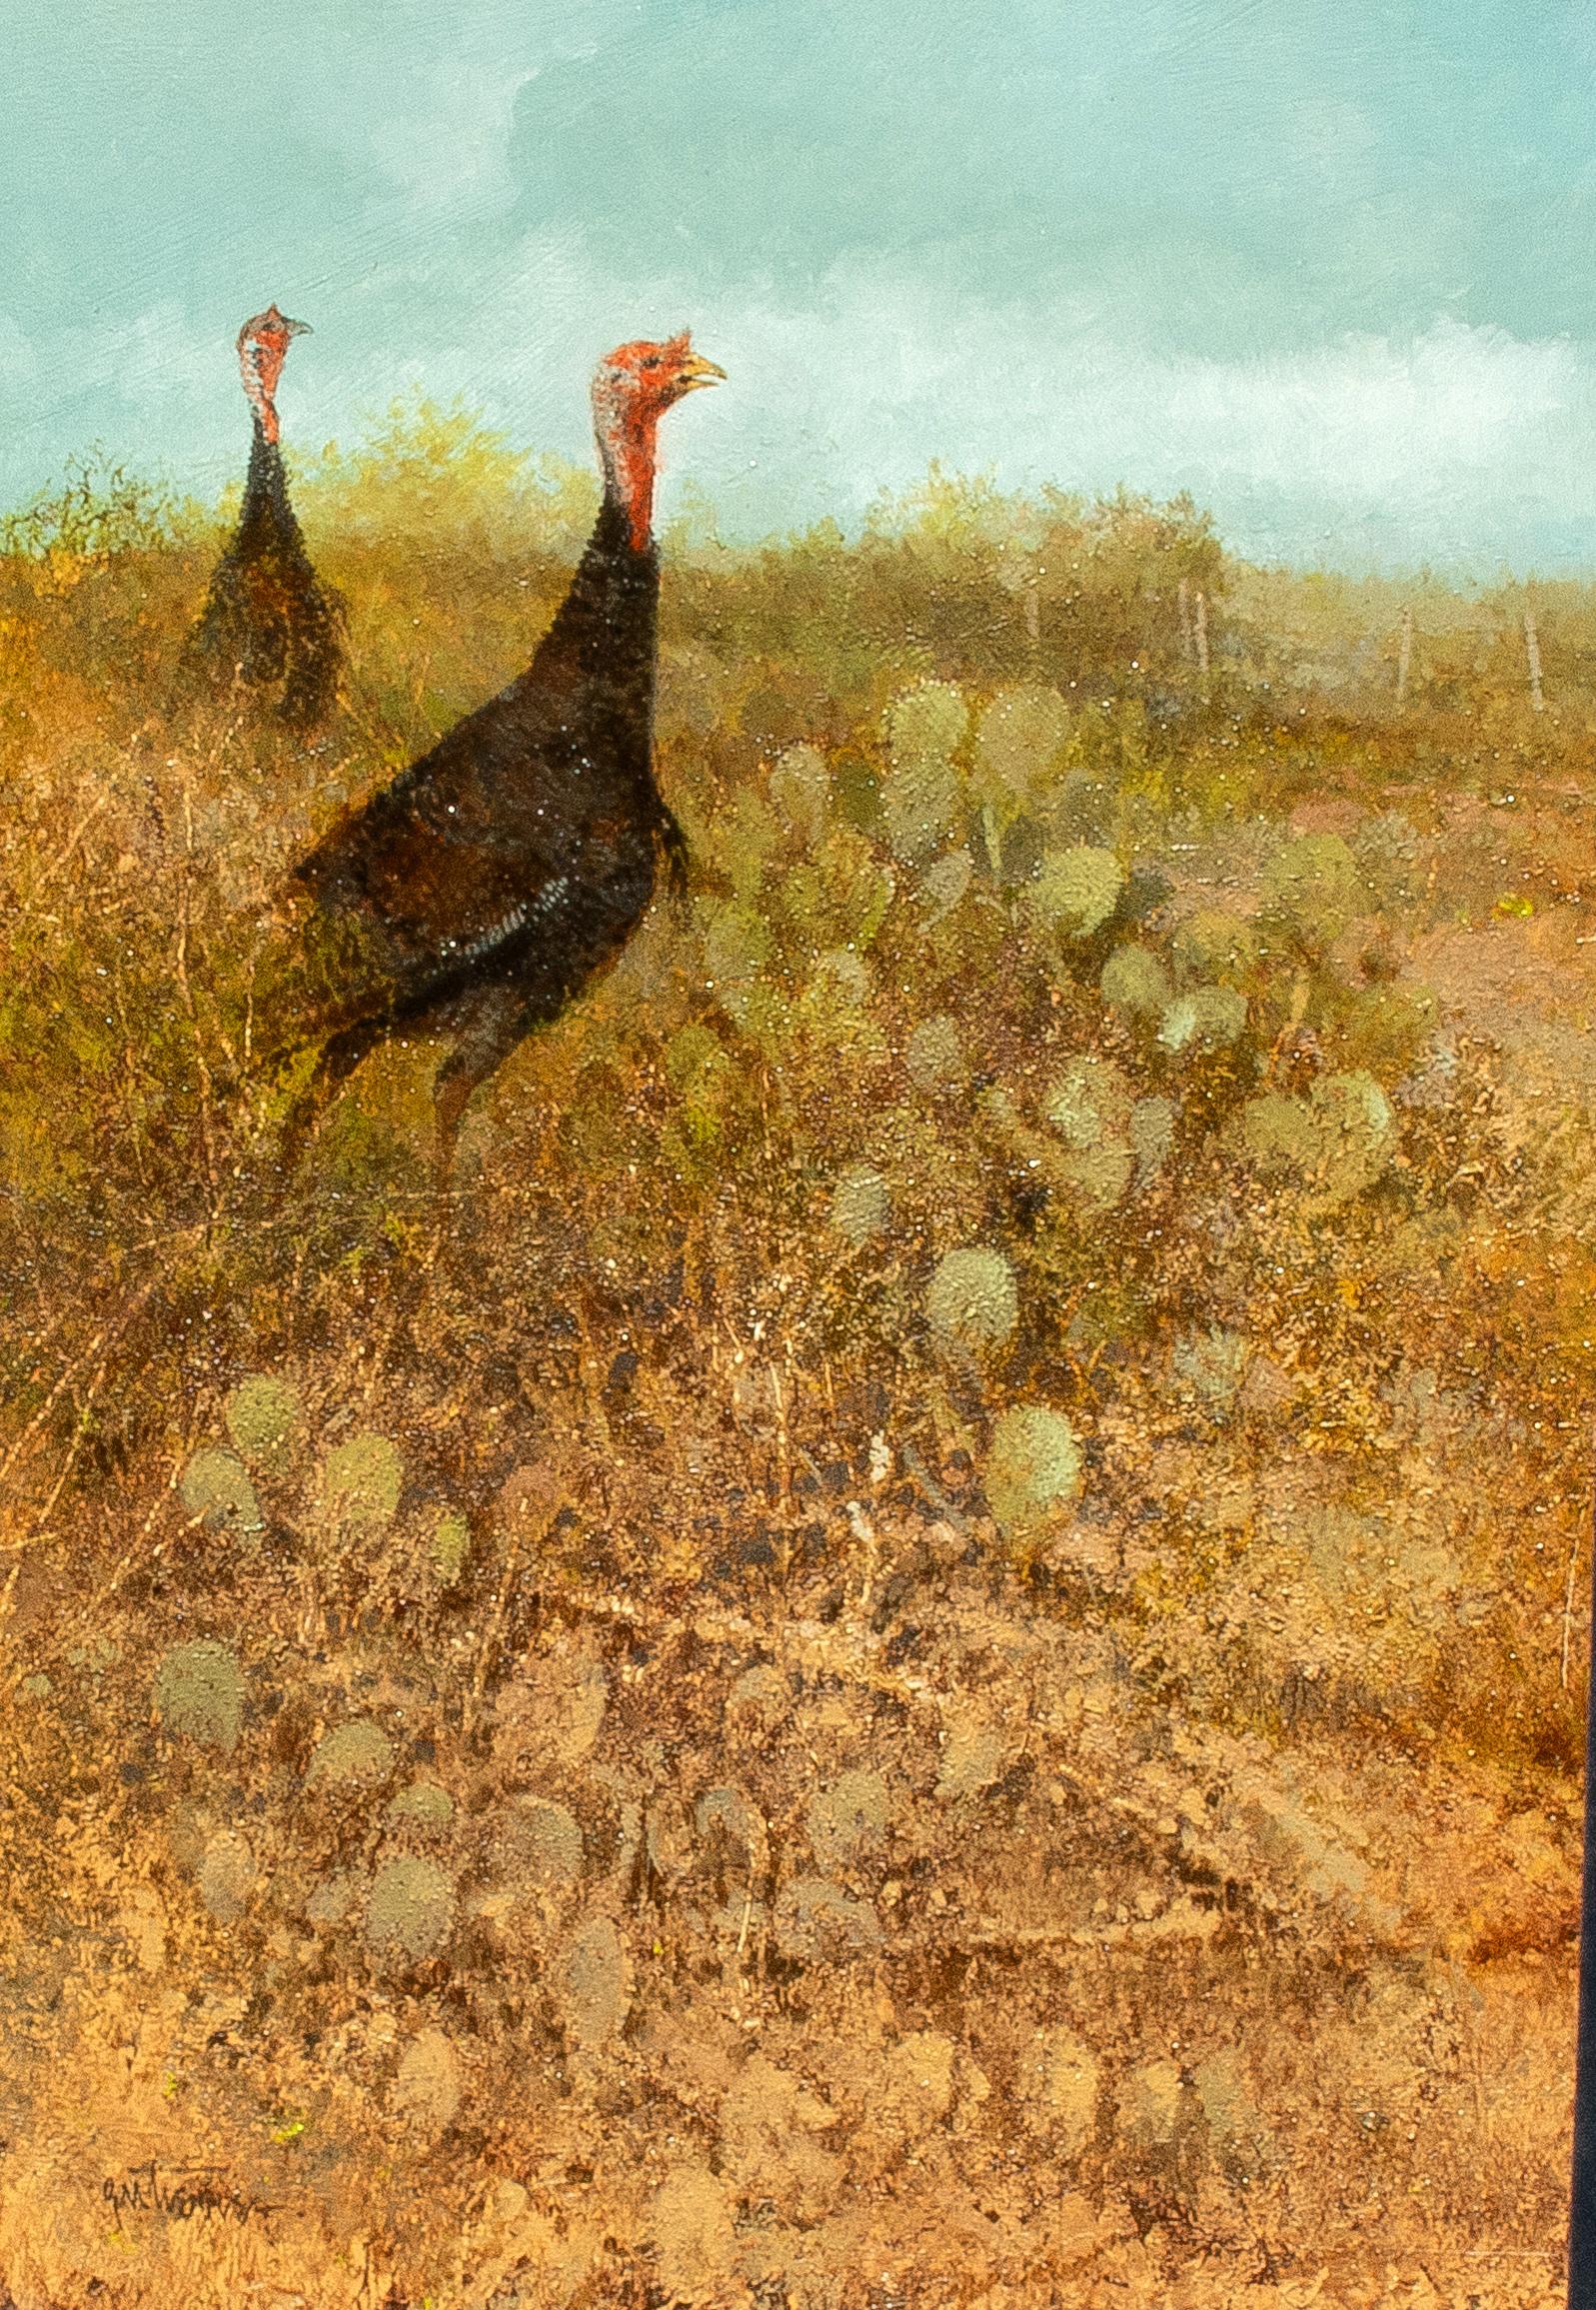 South Texas Turkeys